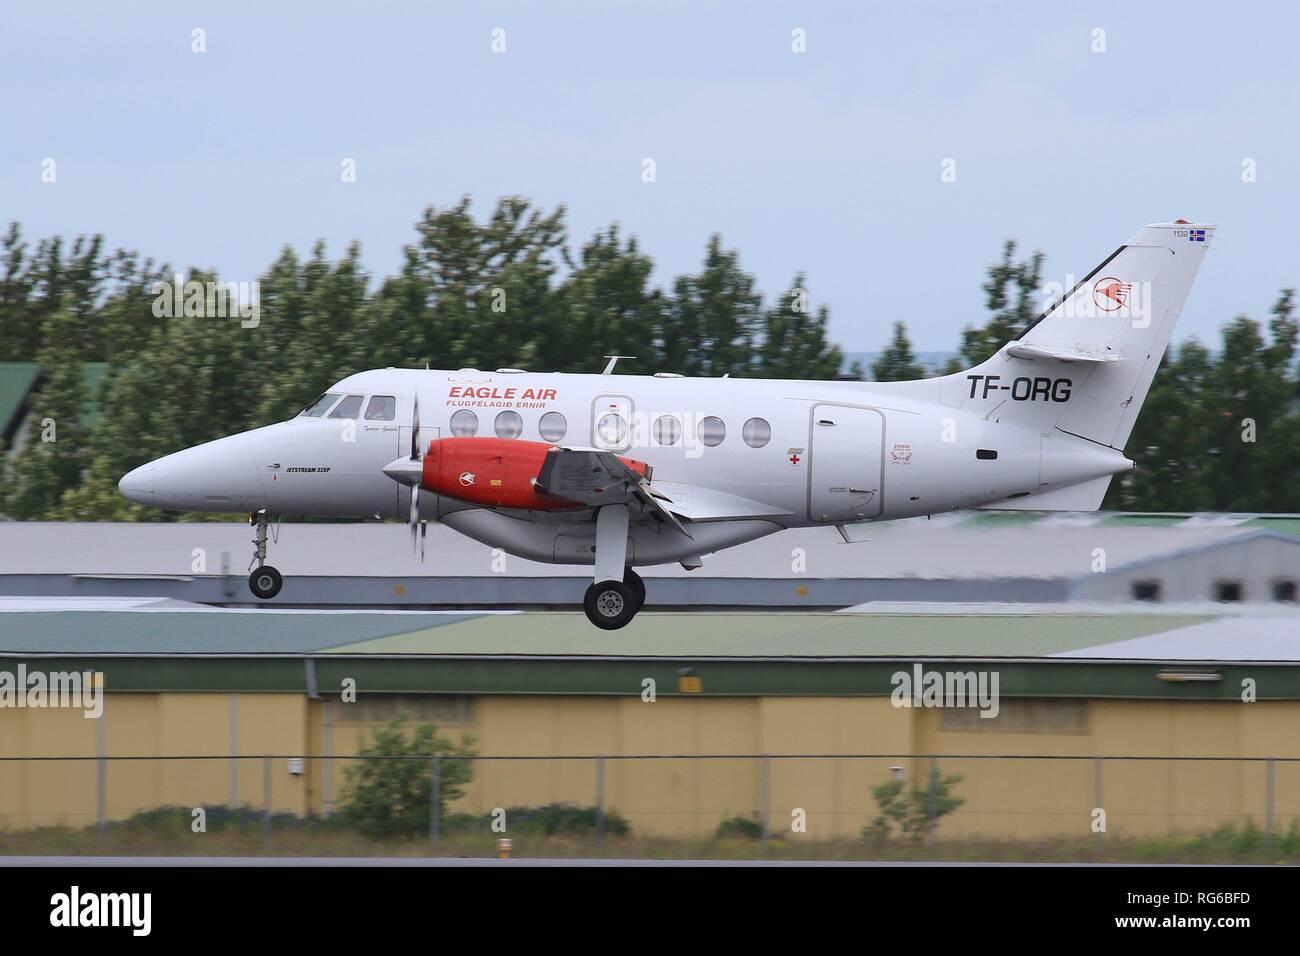 Reykjavik, Iceland – July 4, 2017: Eagle Air Flugfelagid Ernir Jetstream airplane at Reykjavik airport (RKV) in Iceland.   usage worldwide - Stock Image